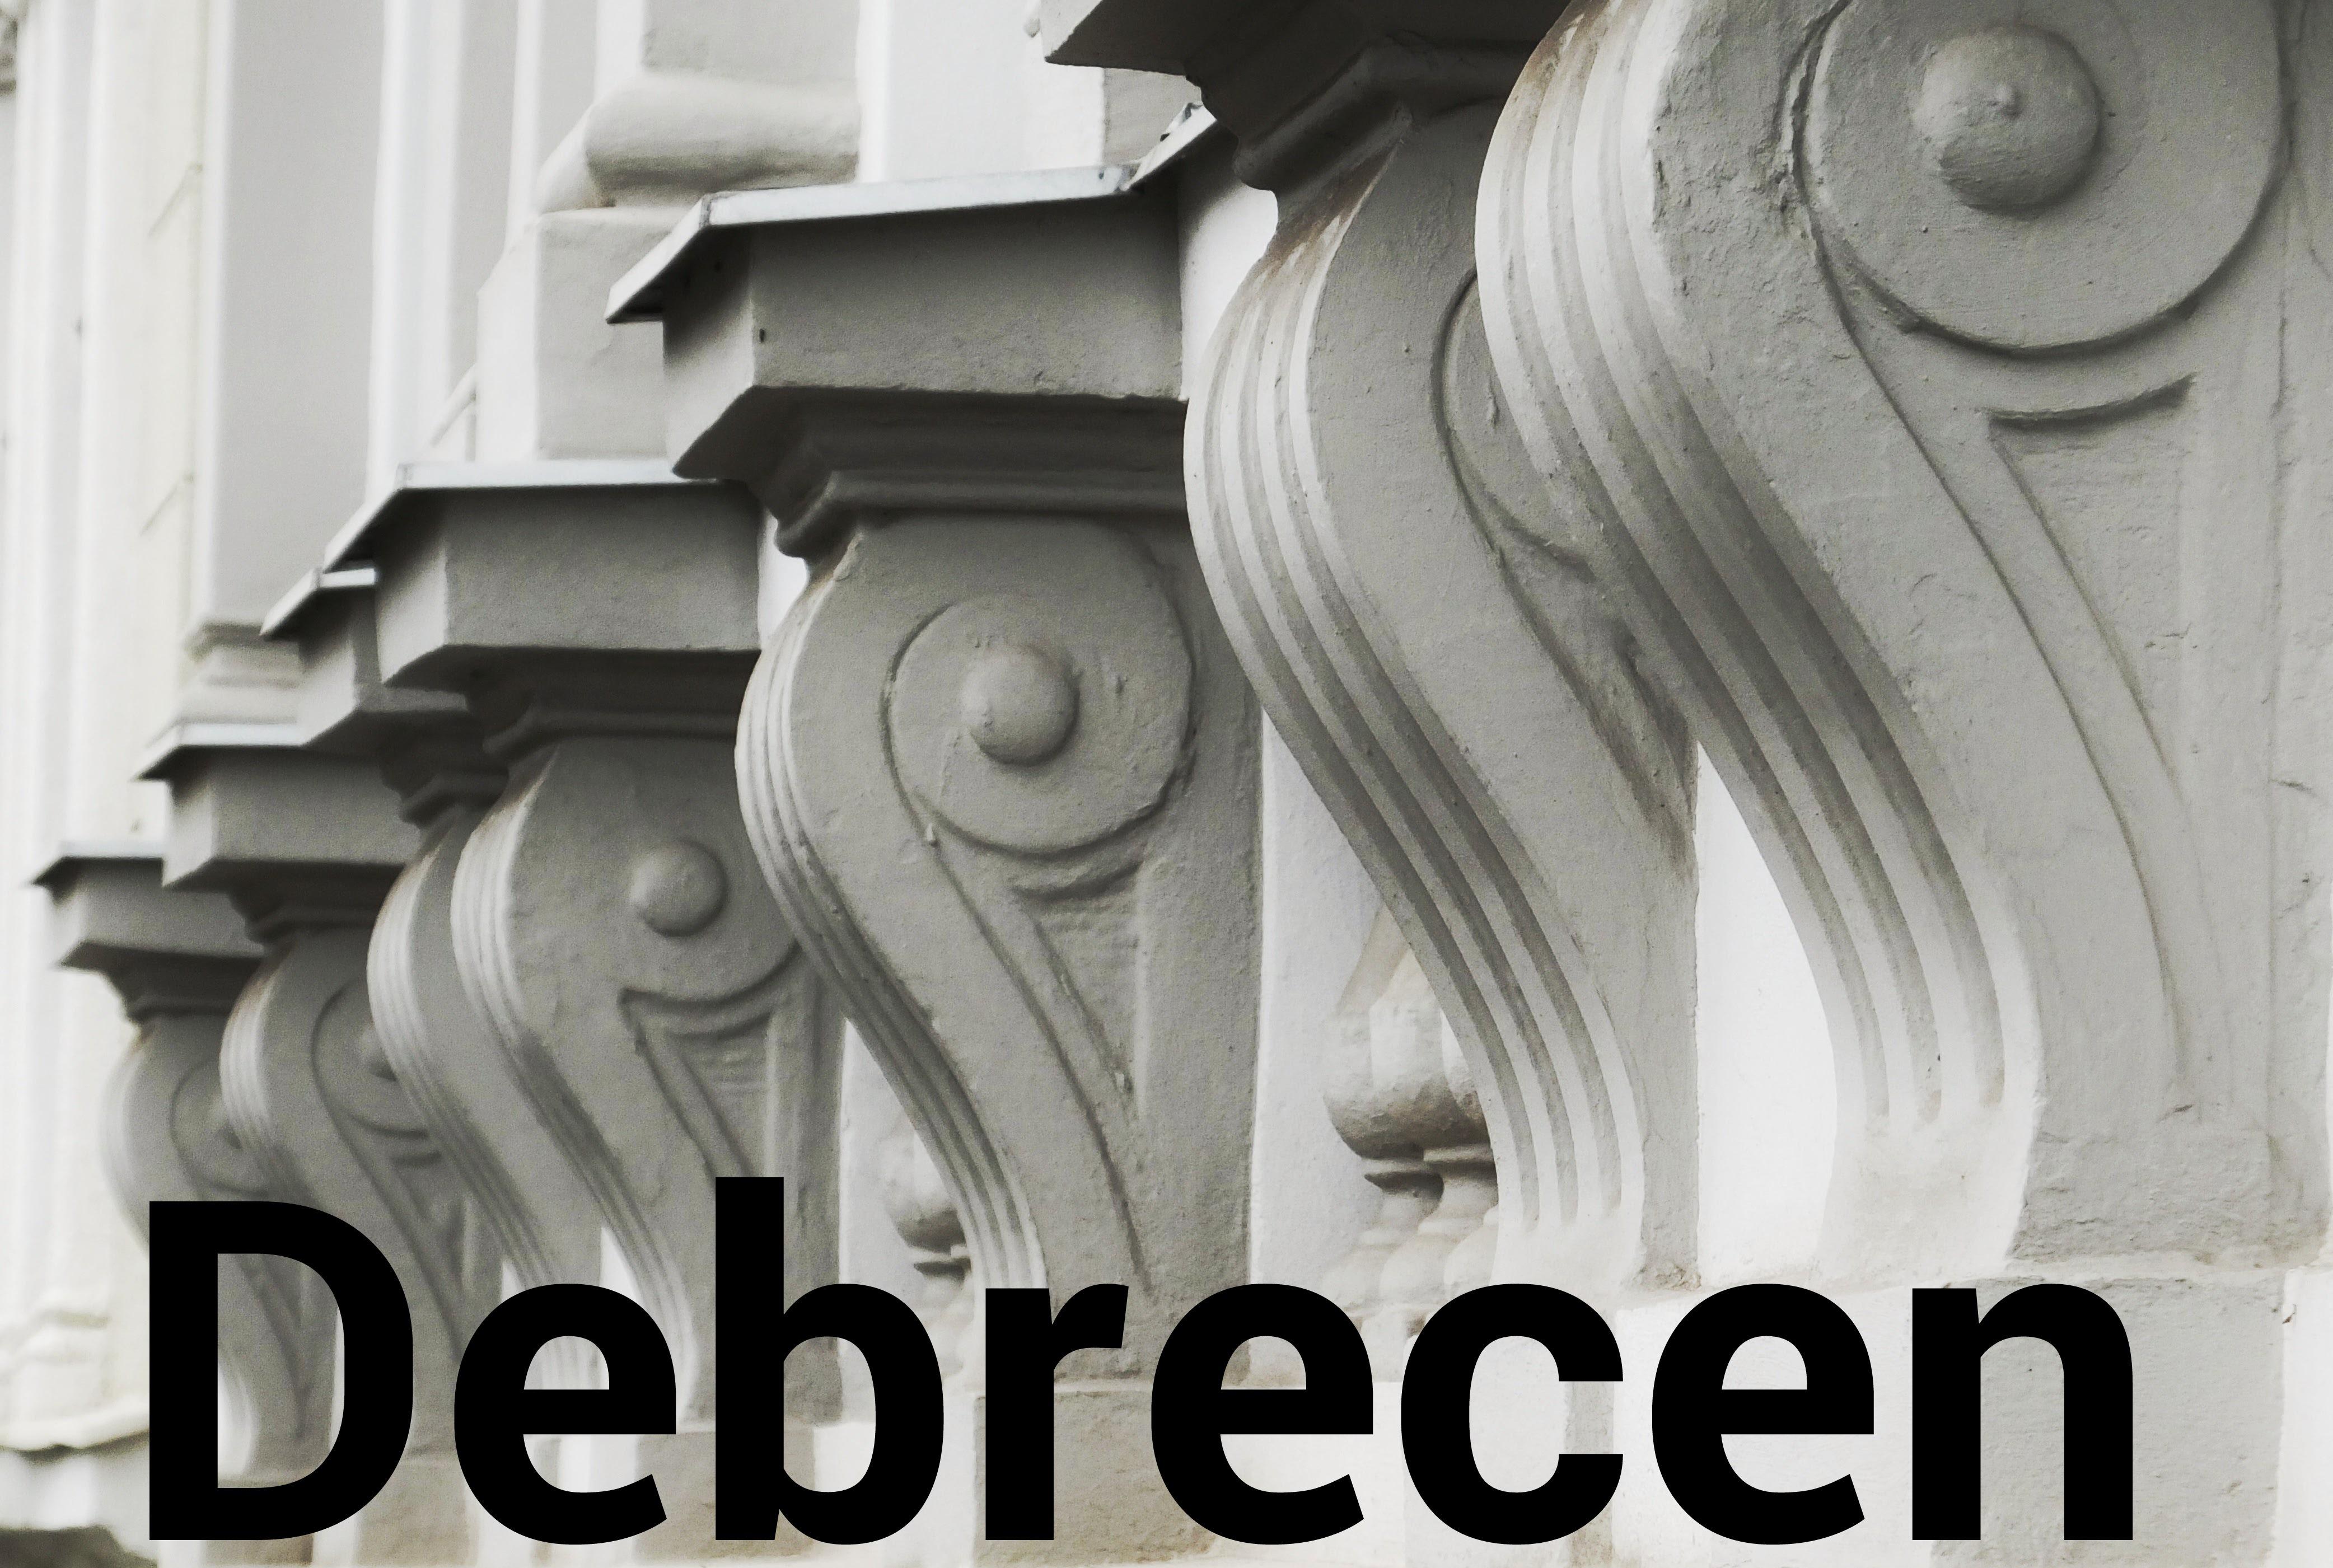 Debrecen, Hungary, Hongrie, Magyarország. Asicu, As I See You. Ahogy én láttam. 2017